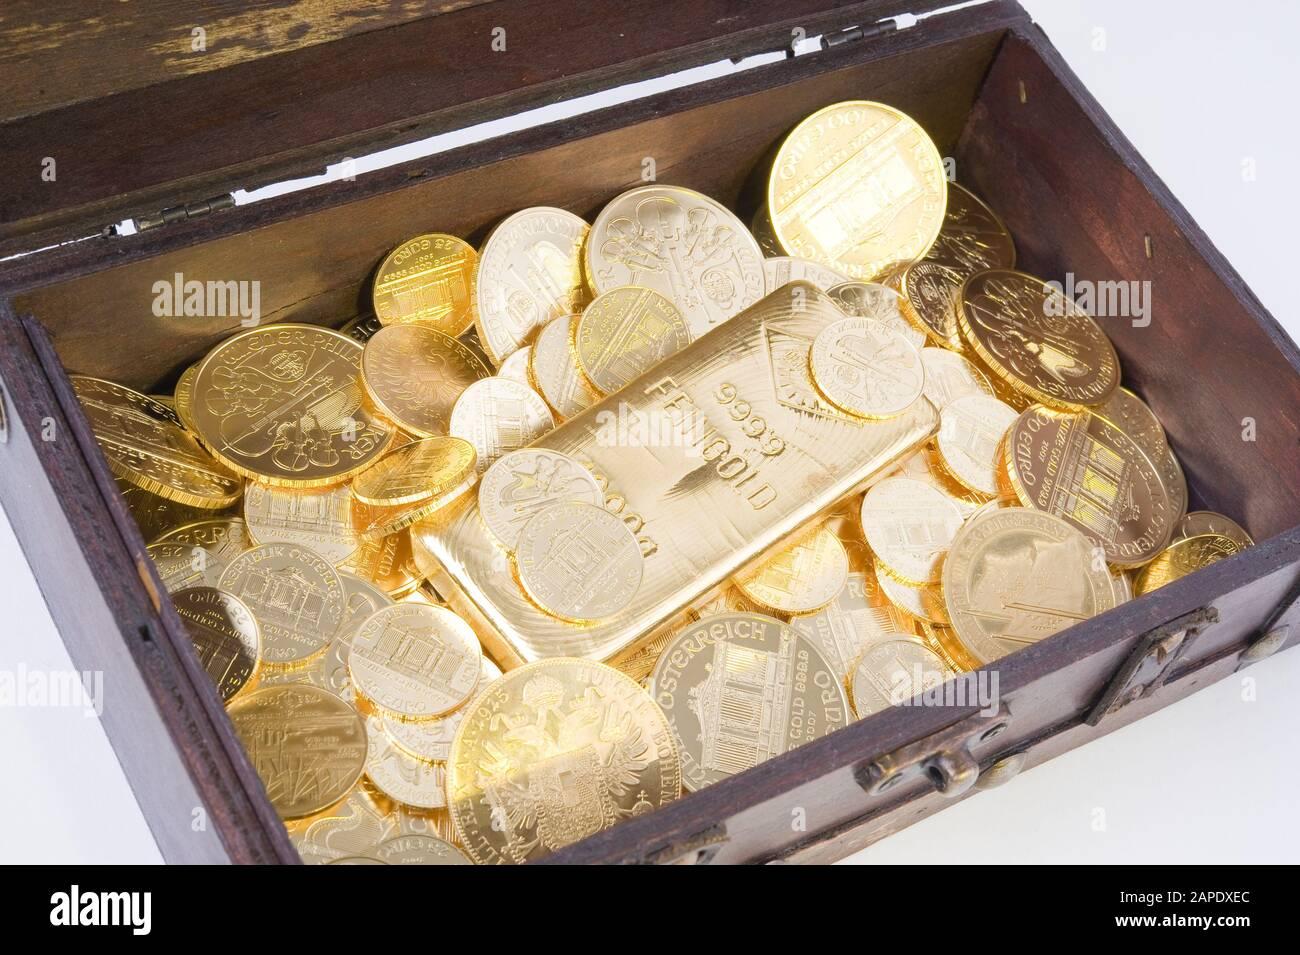 Schatztruhe - Treasure Chest Stock Photo